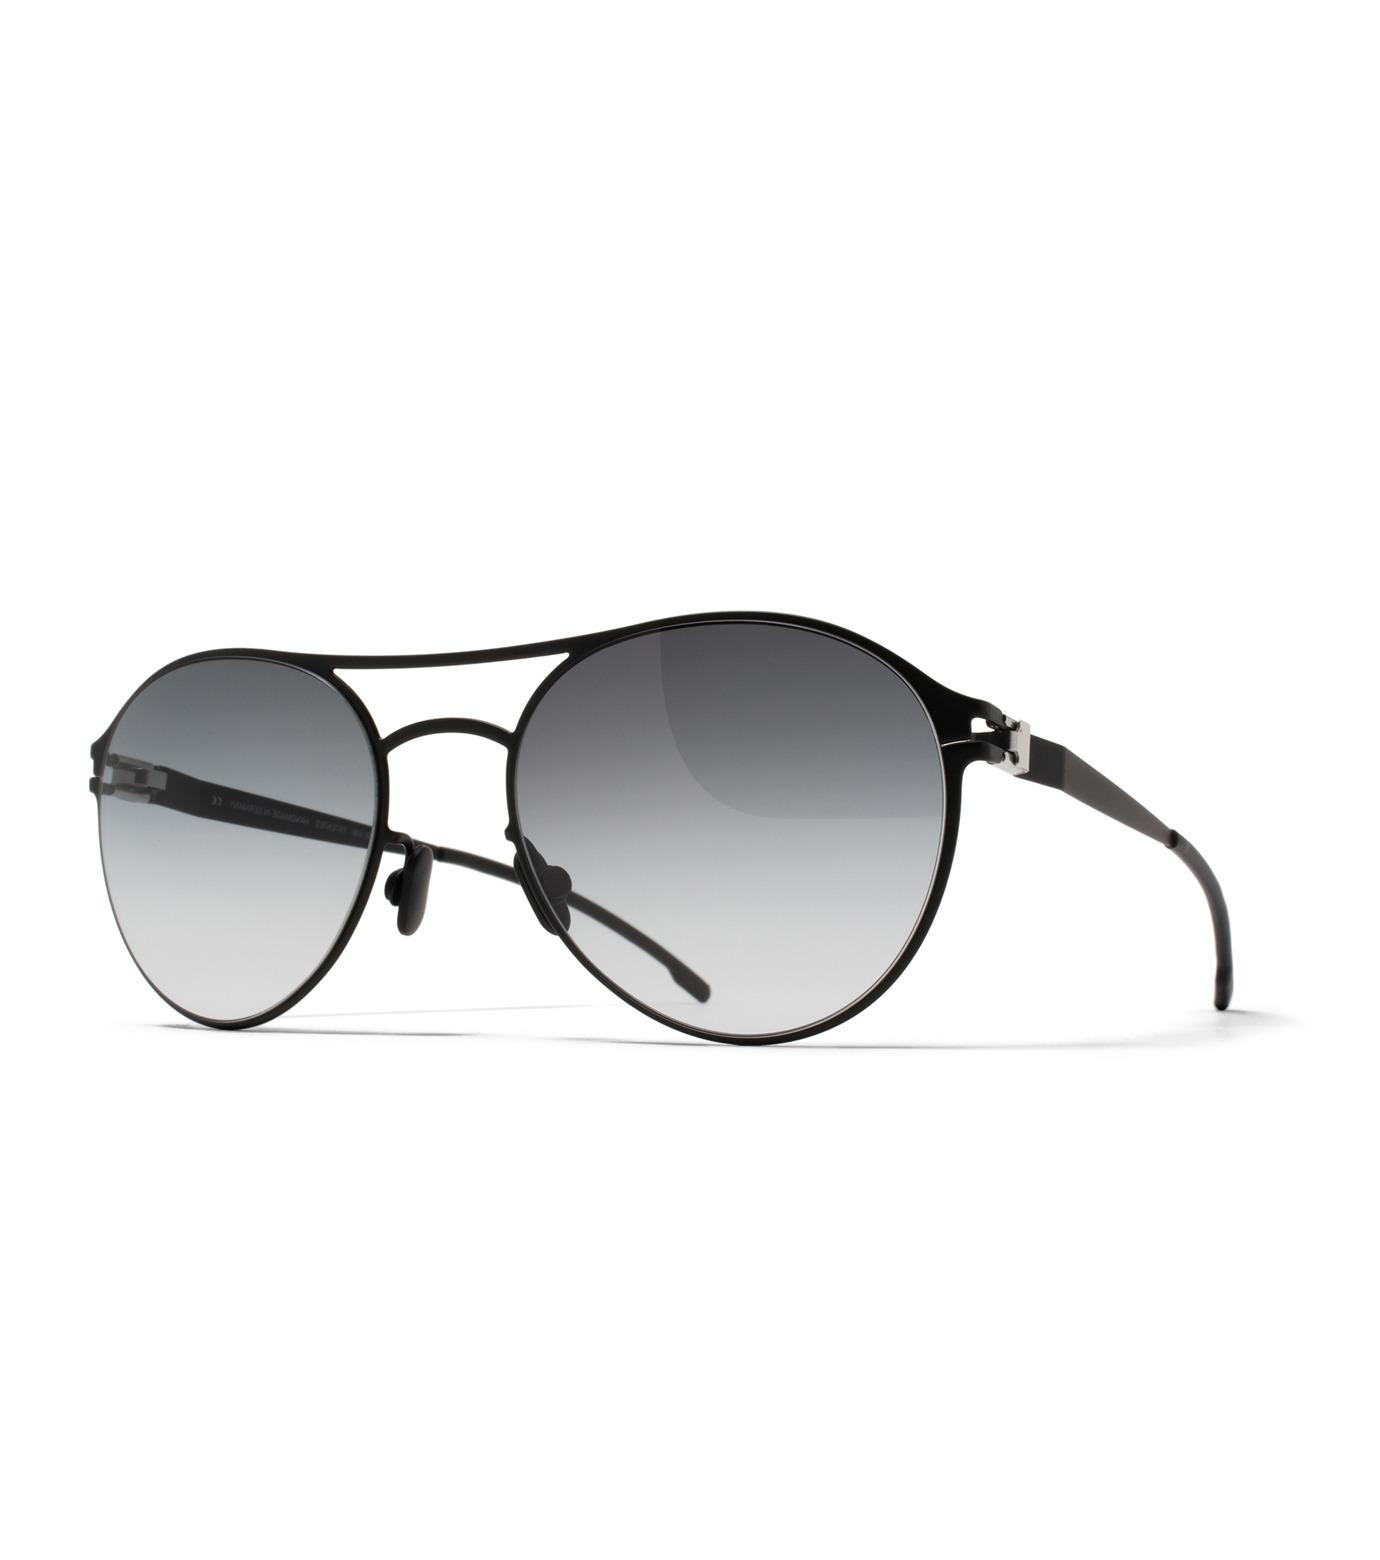 MYKITA(マイキータ)のSPARROW-BLACK(アイウェア/eyewear)-SPARROW-13 拡大詳細画像1